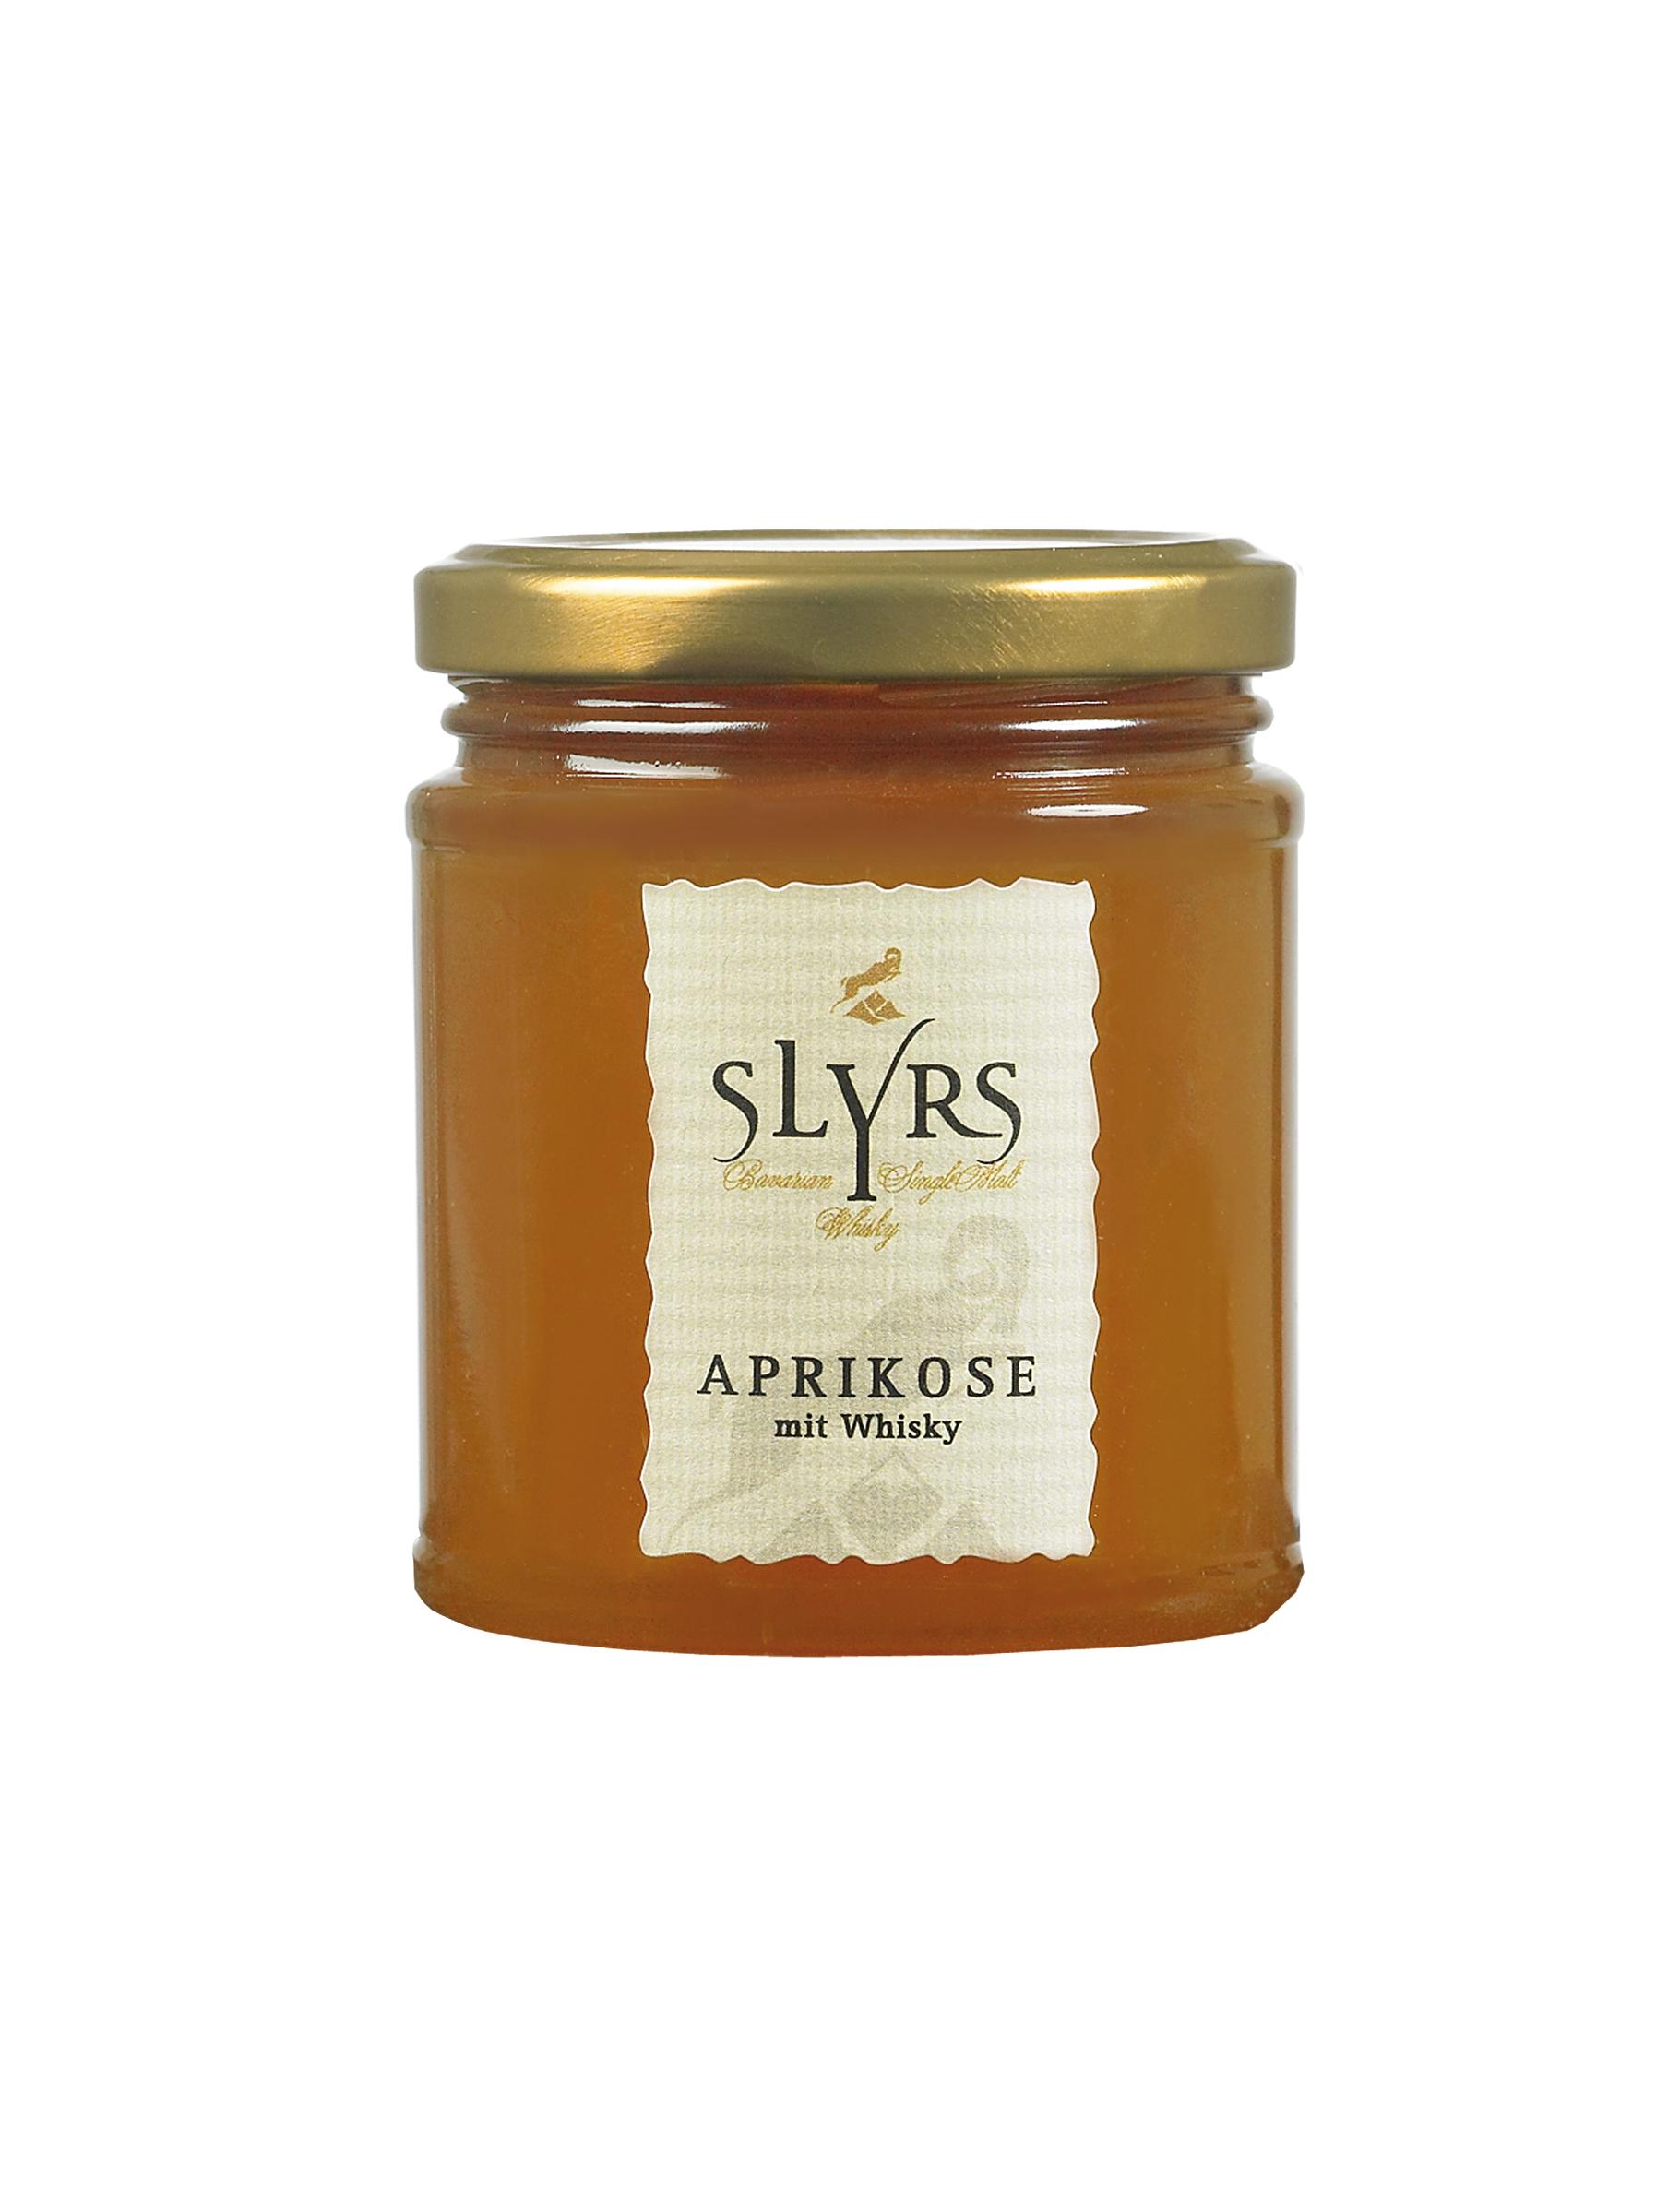 Slyrs Marmelade Aprikose